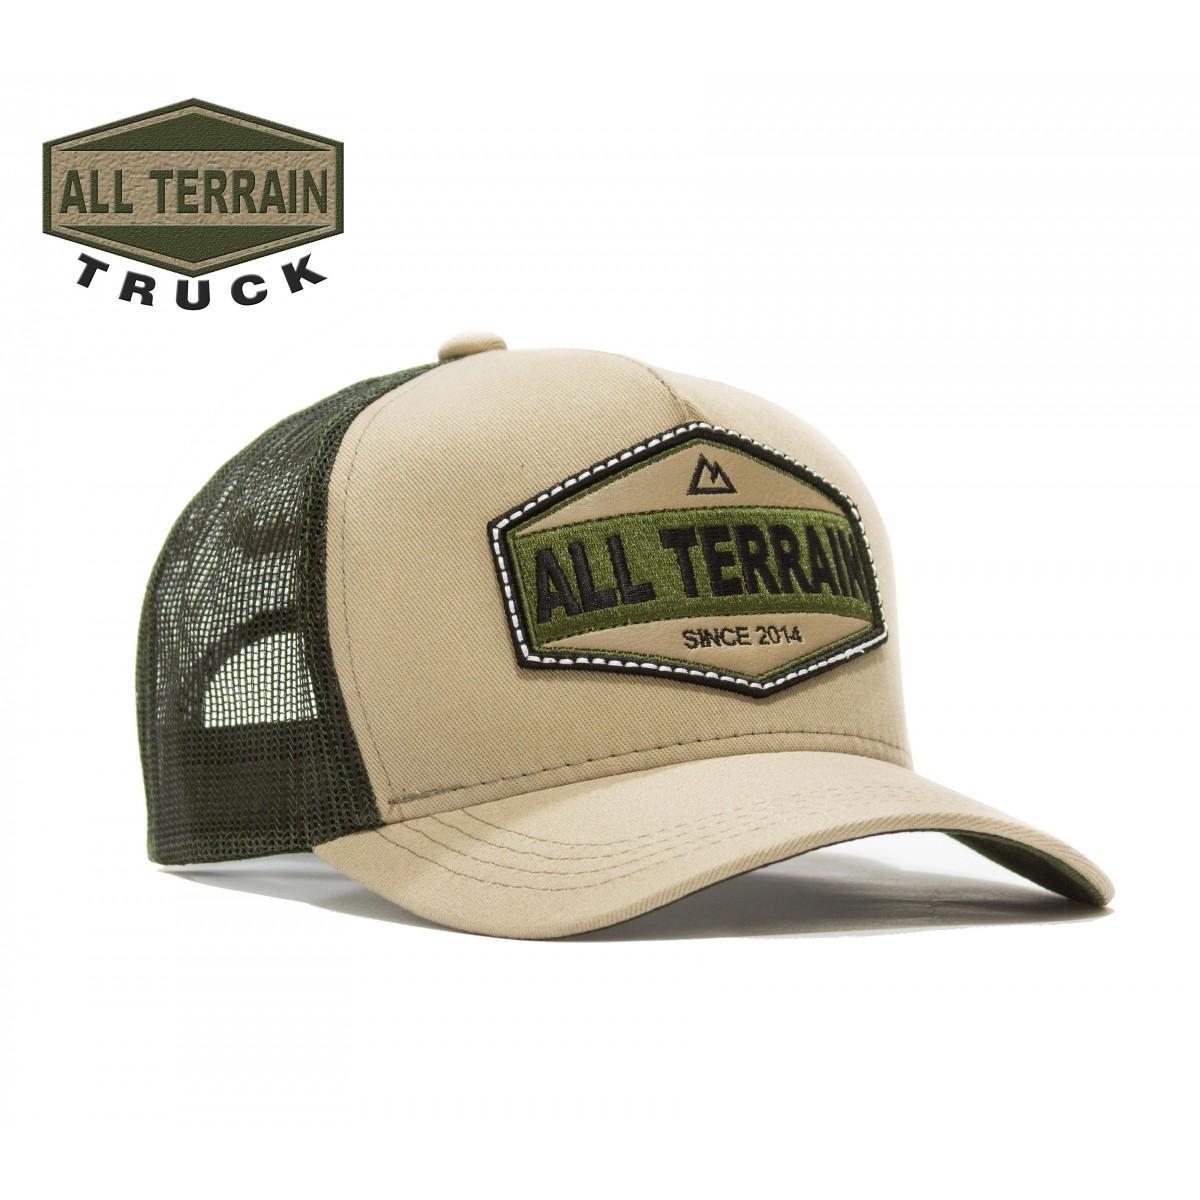 Boné All Terrain Truck Caqui f5738b9954b